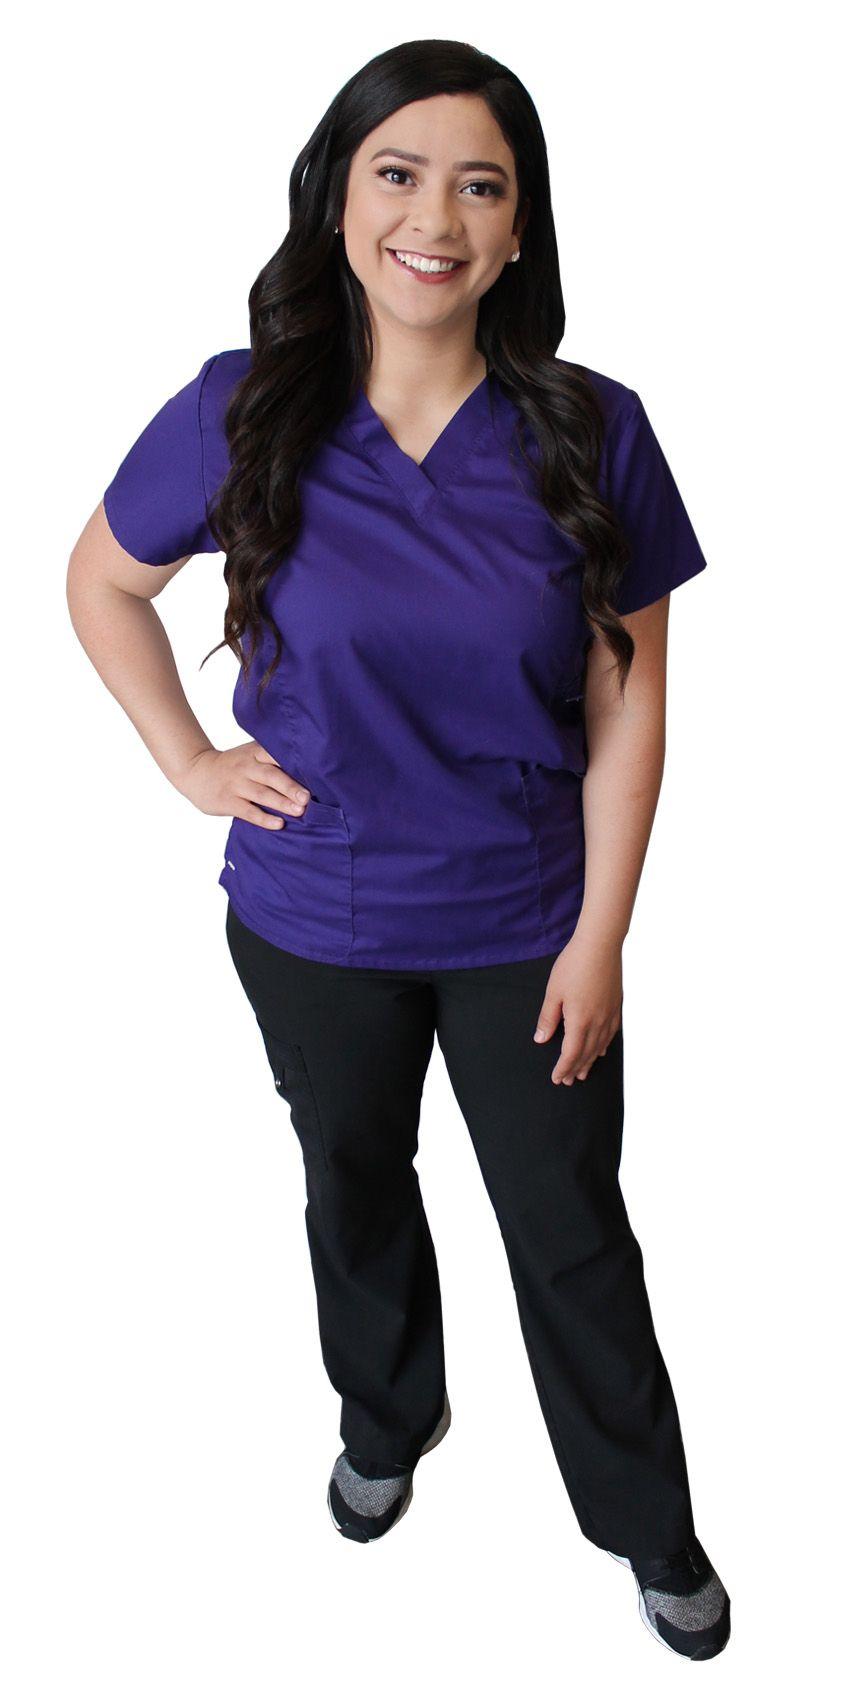 Yesenia Nuñez